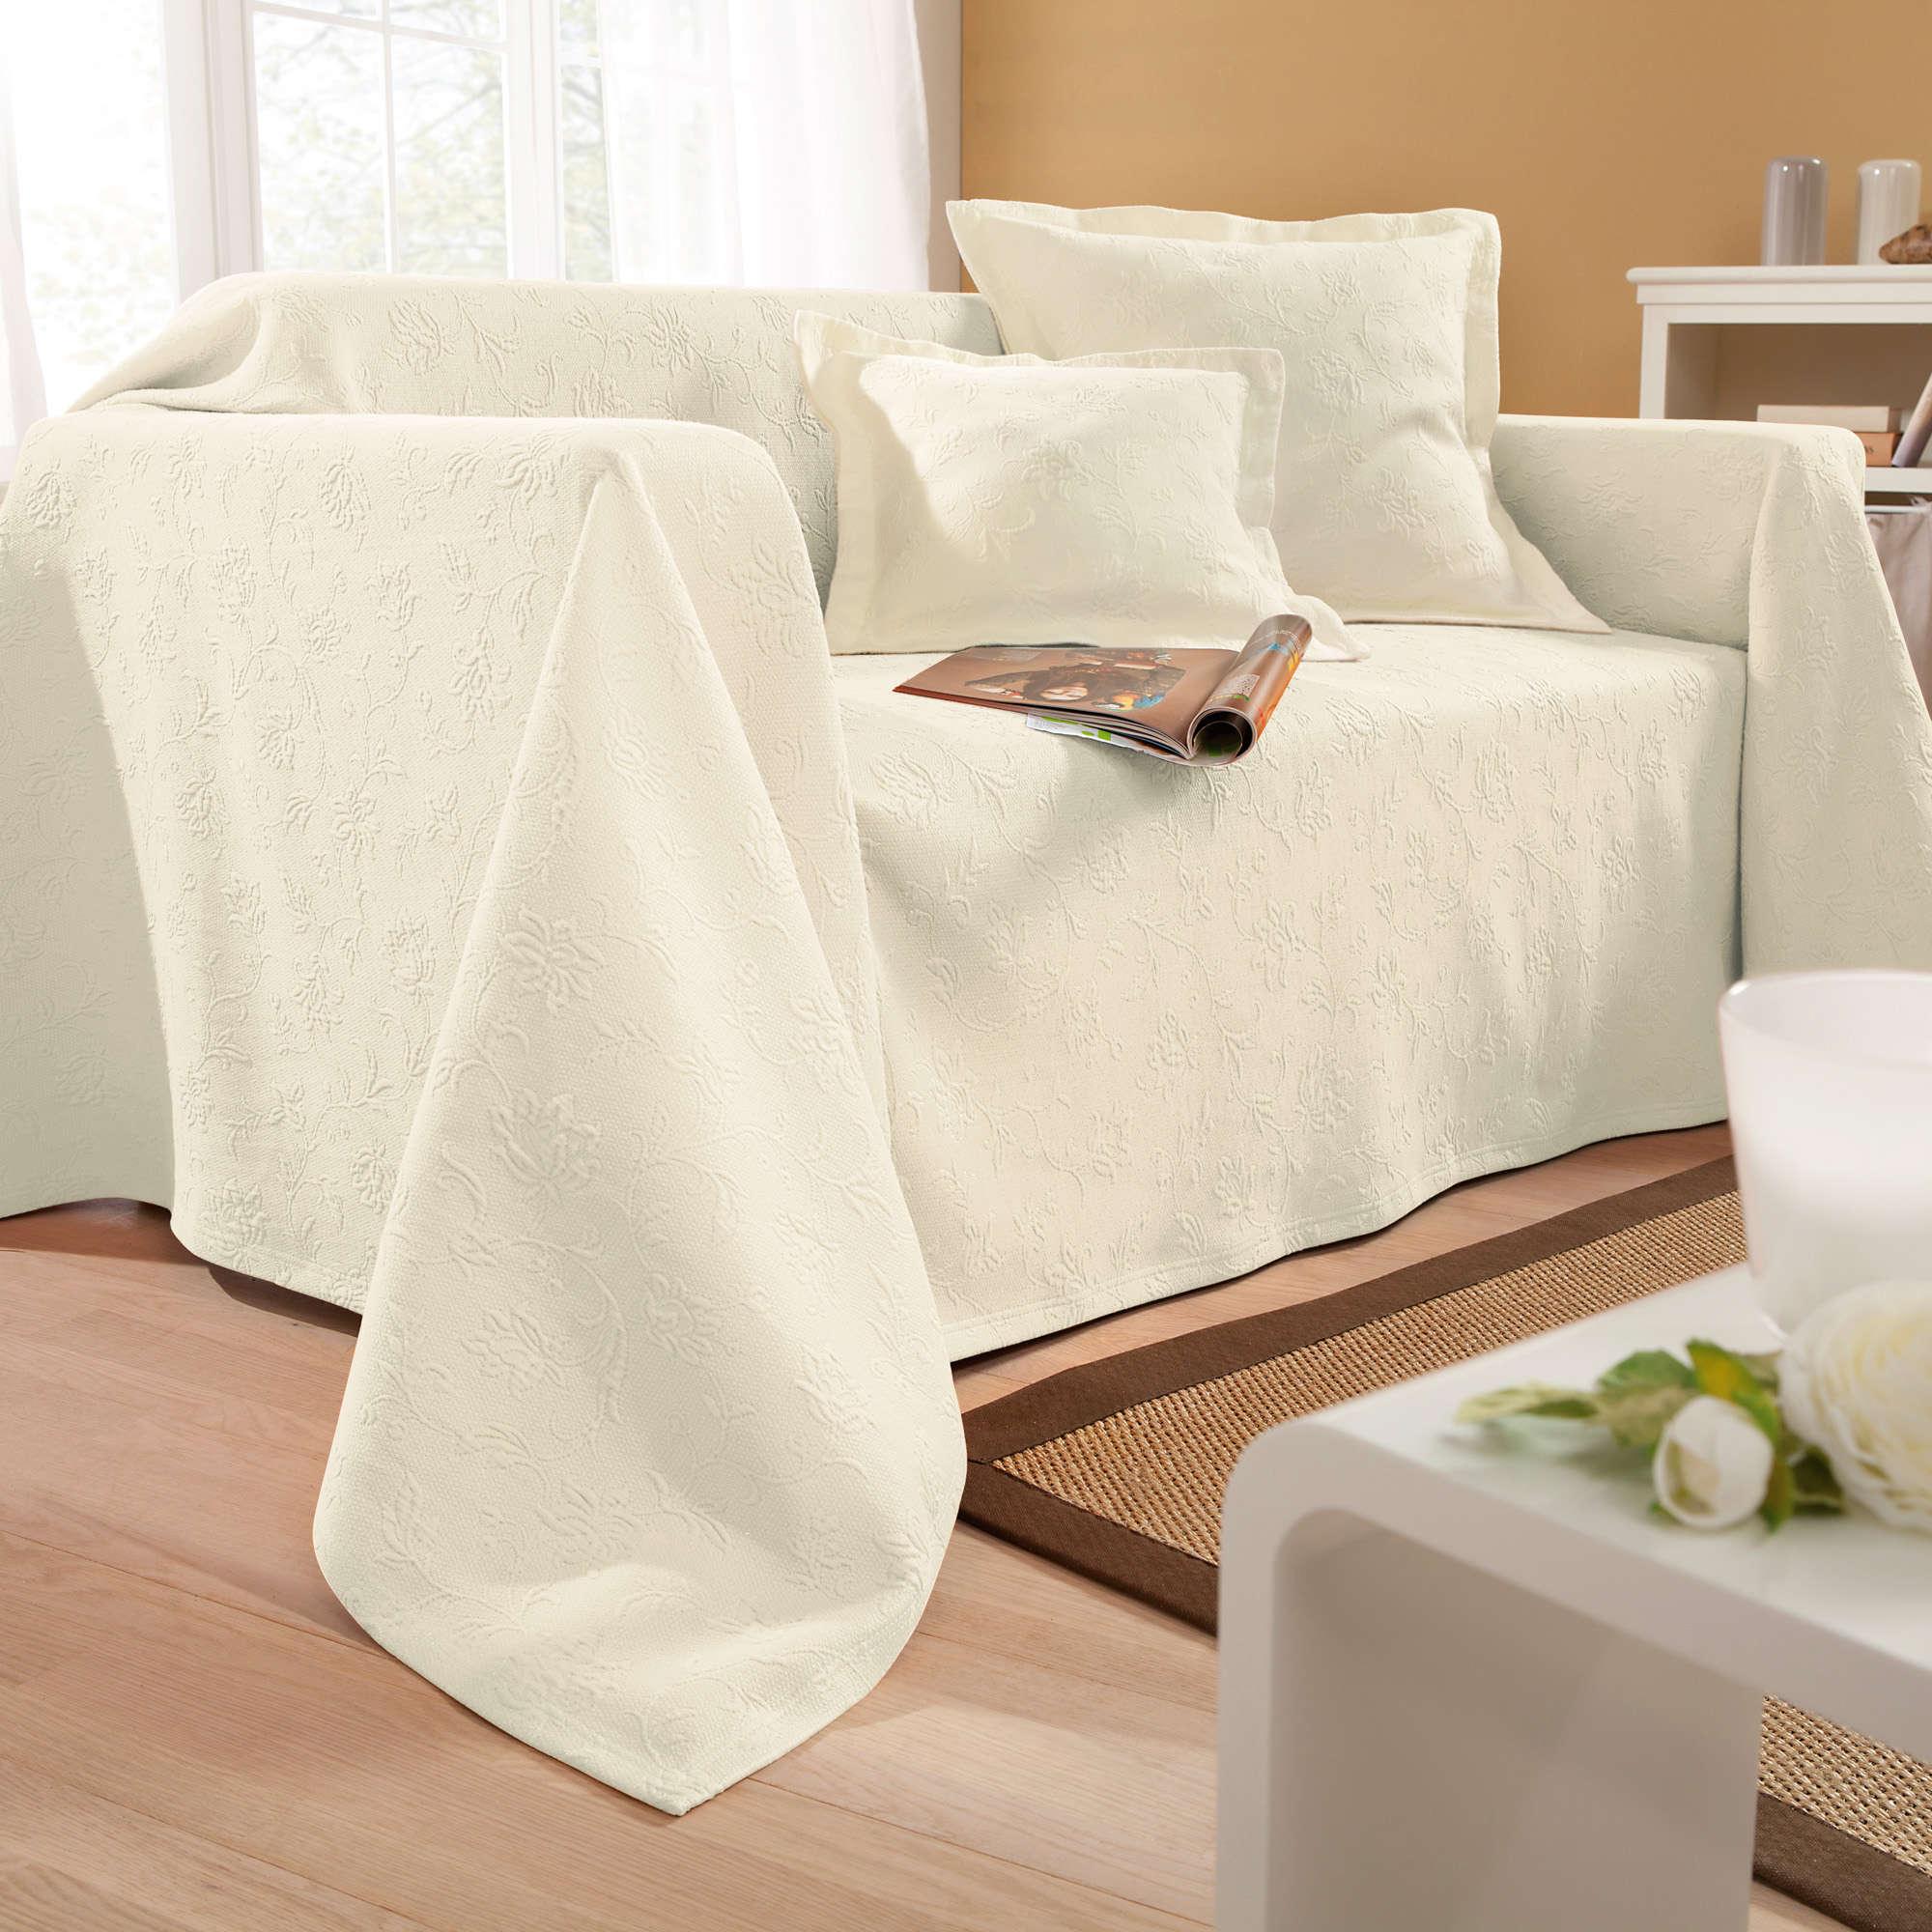 erwin m ller sessel und sofa berwurf ebay. Black Bedroom Furniture Sets. Home Design Ideas